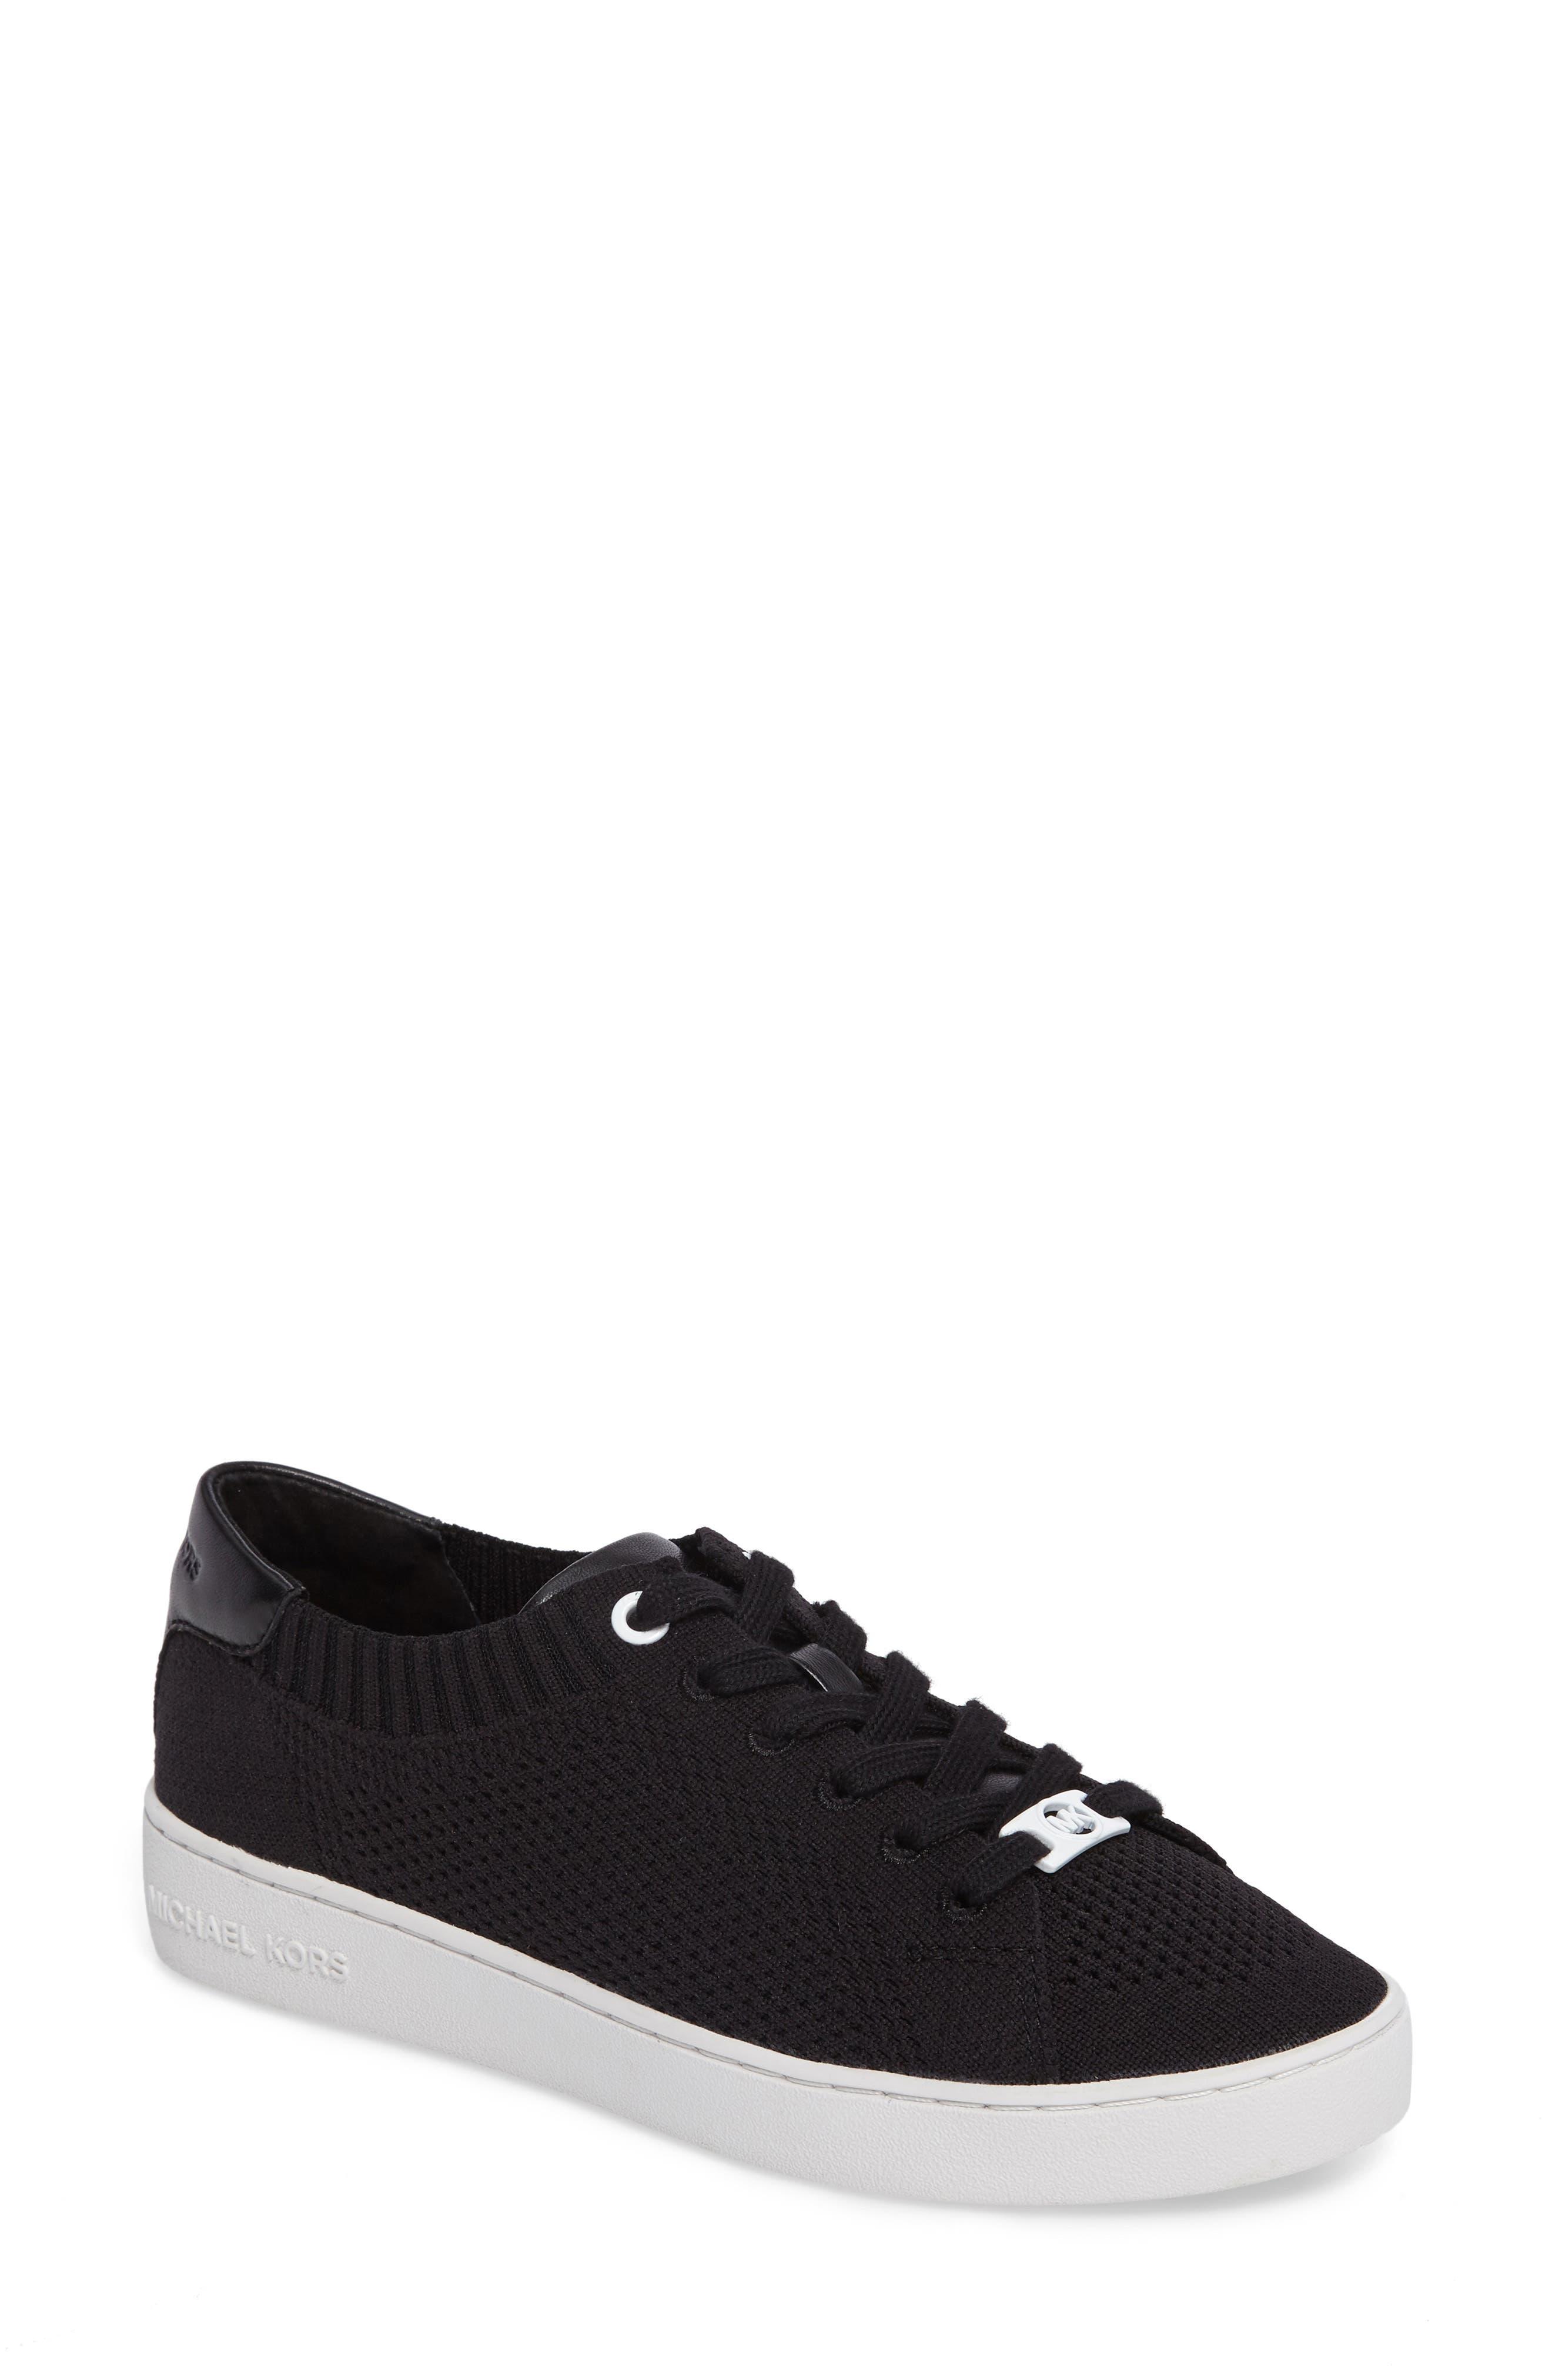 Skyler Knit Sneaker,                         Main,                         color, 001